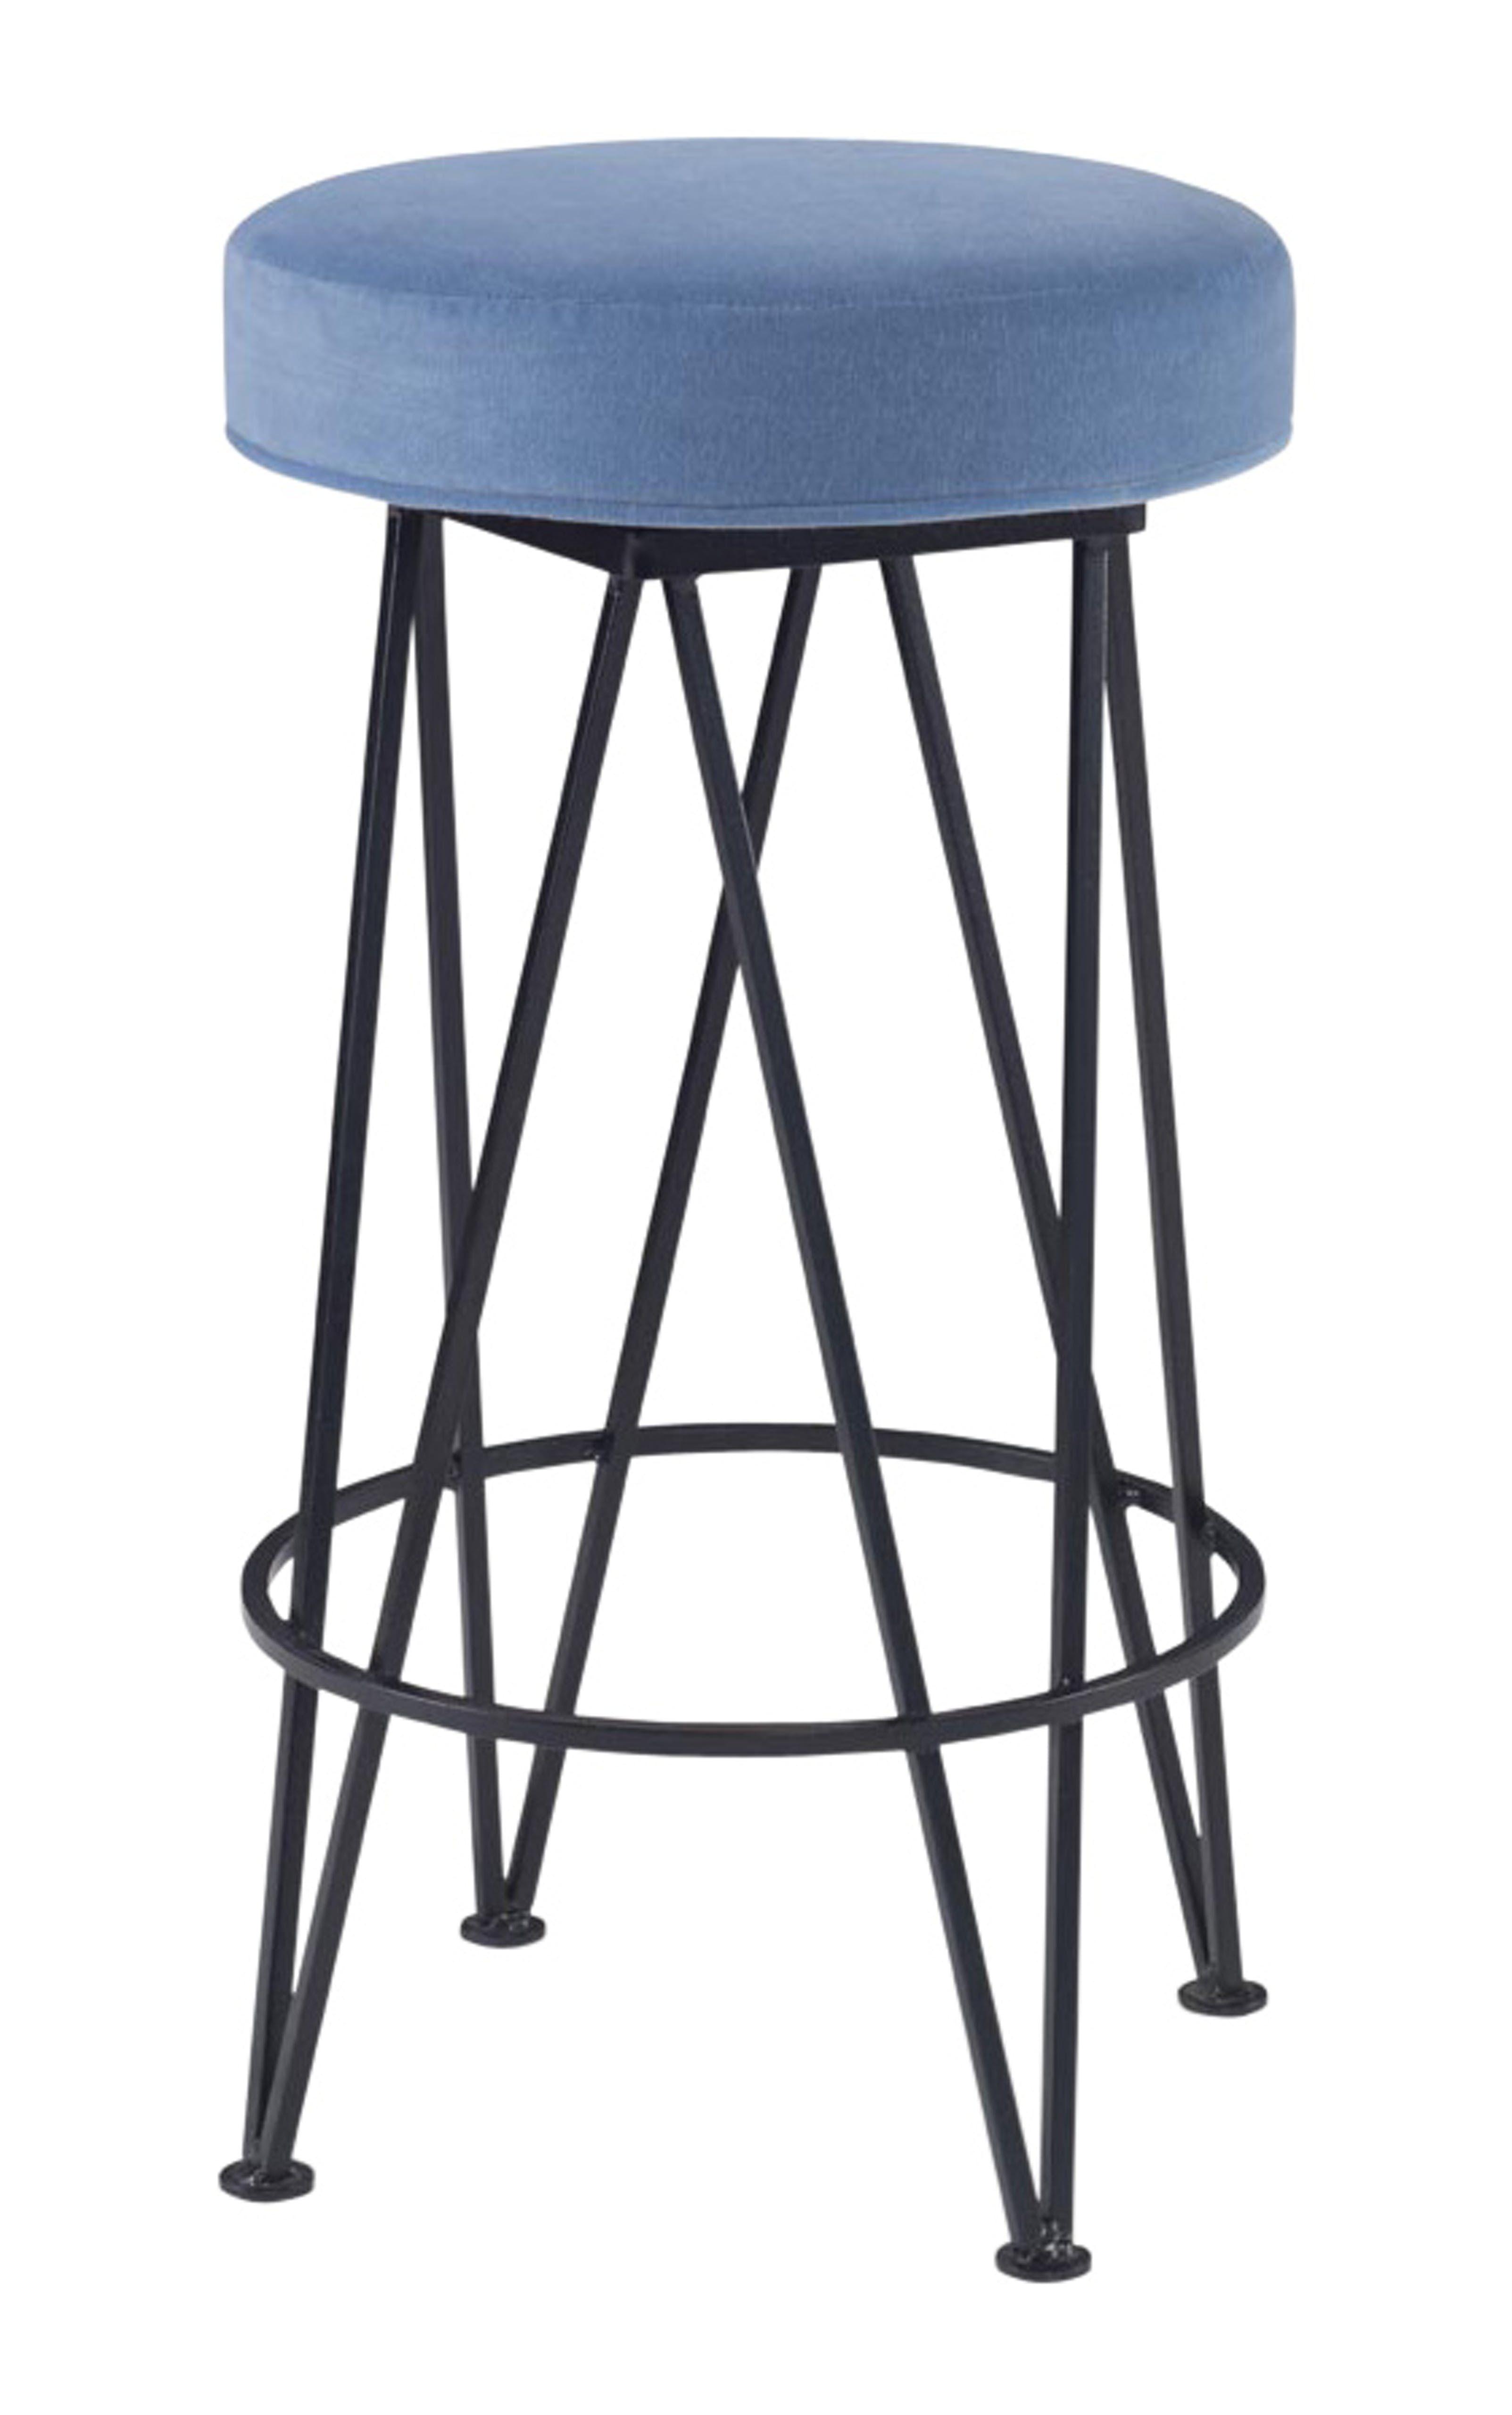 Mr Brown London 43782 Furniture Furniture Seating Stools Metal Upholstery  Fabric